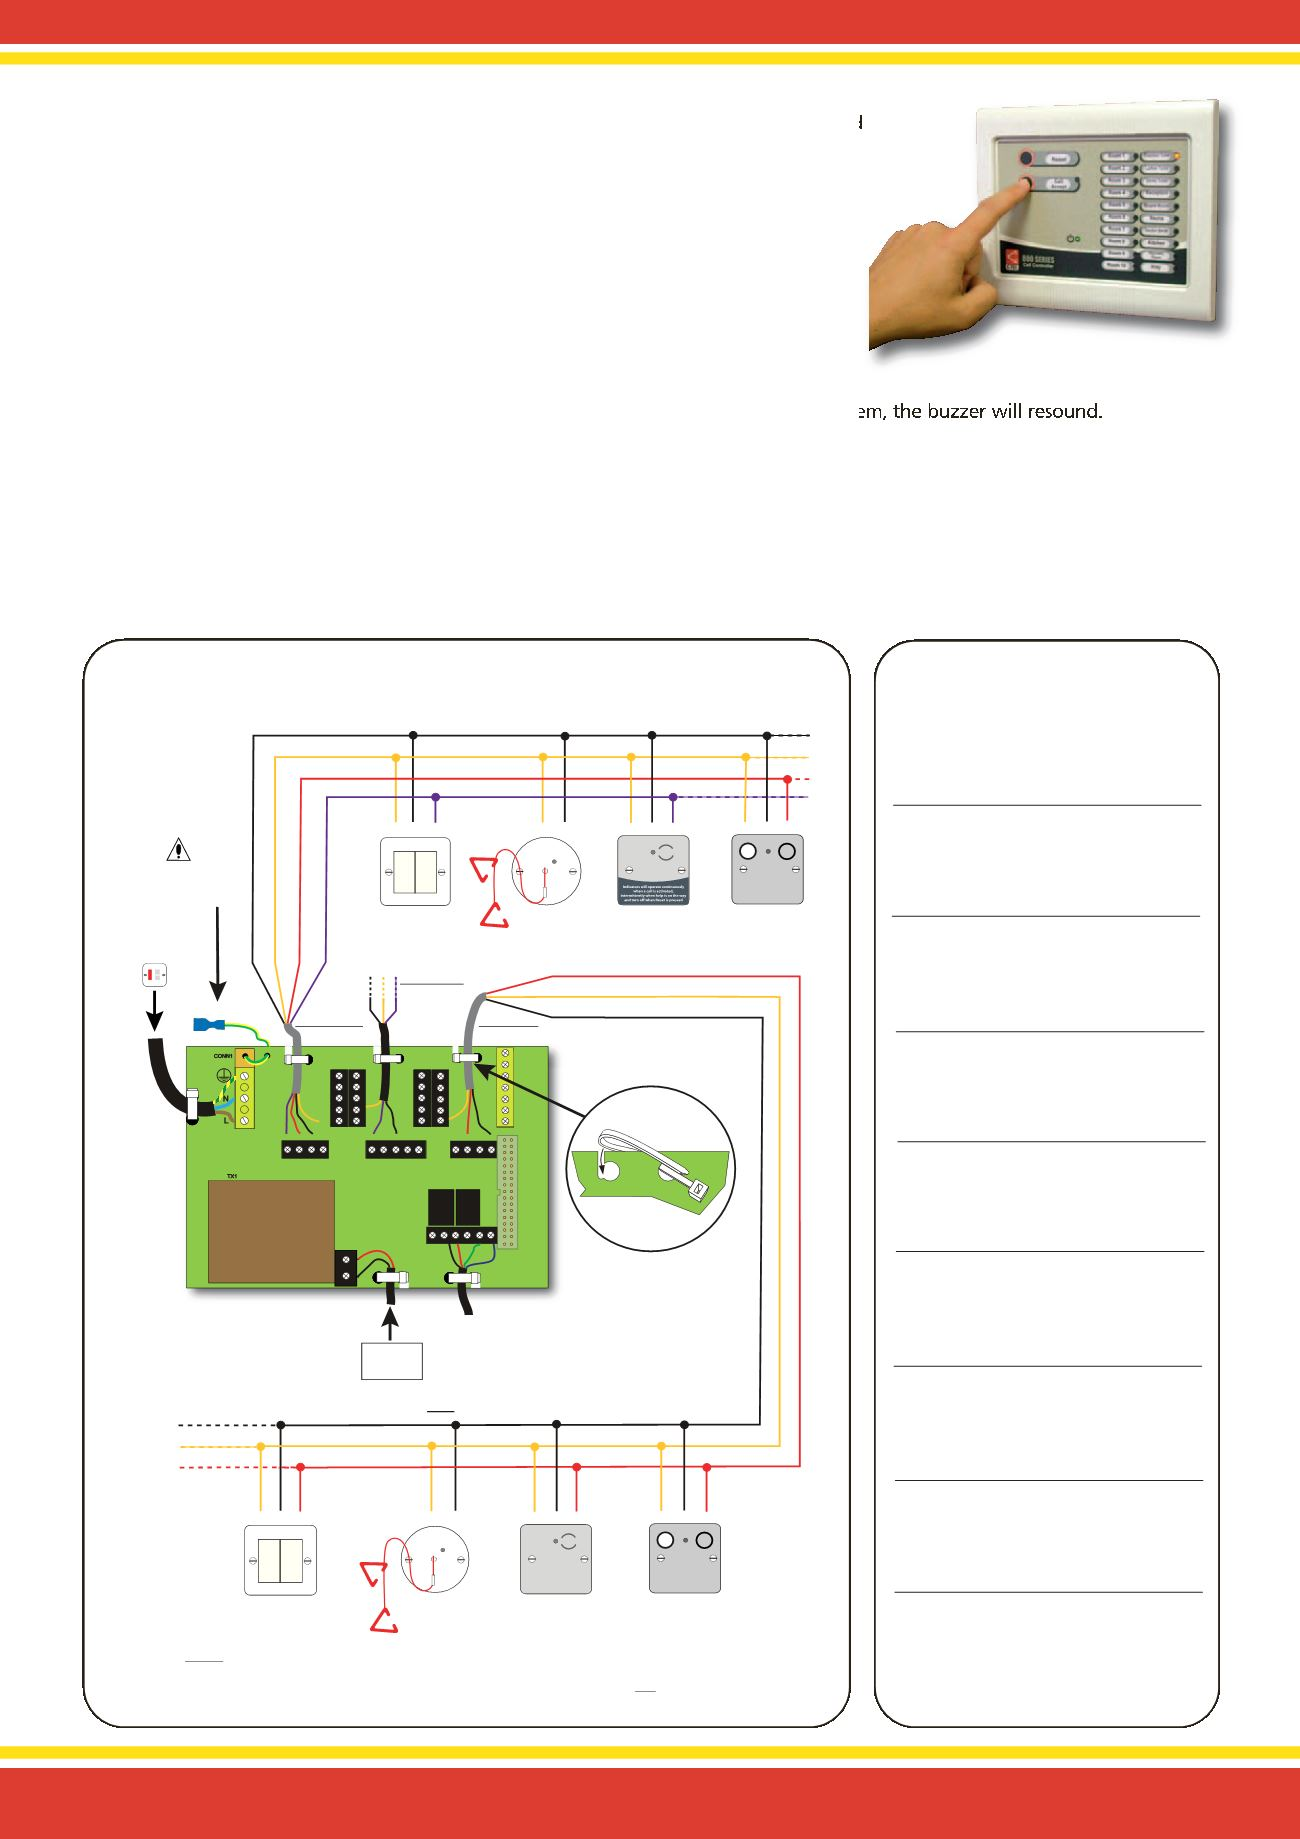 E Tec 1 6l L91 Wiring Diagram Detailed Schematics 2011 Ski Doo C 800 Series Free Download U2022 Oasis Dl Co